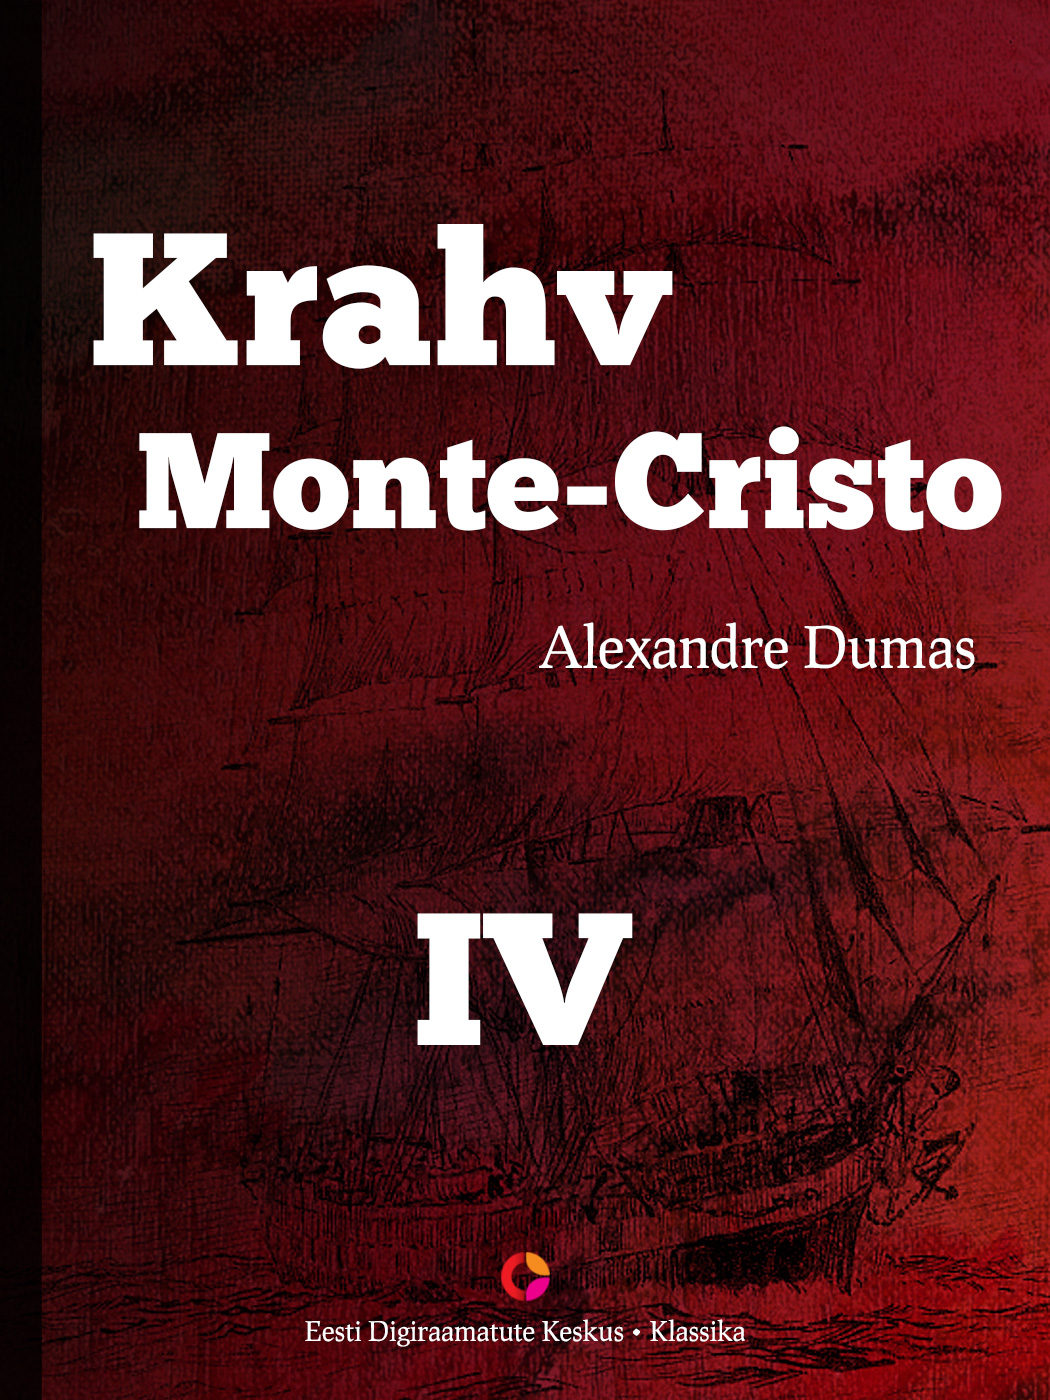 Alexandre Dumas Krahv Monte-Cristo. 4. osa ivar sinimets ungari kirjandus mitteungarlasele